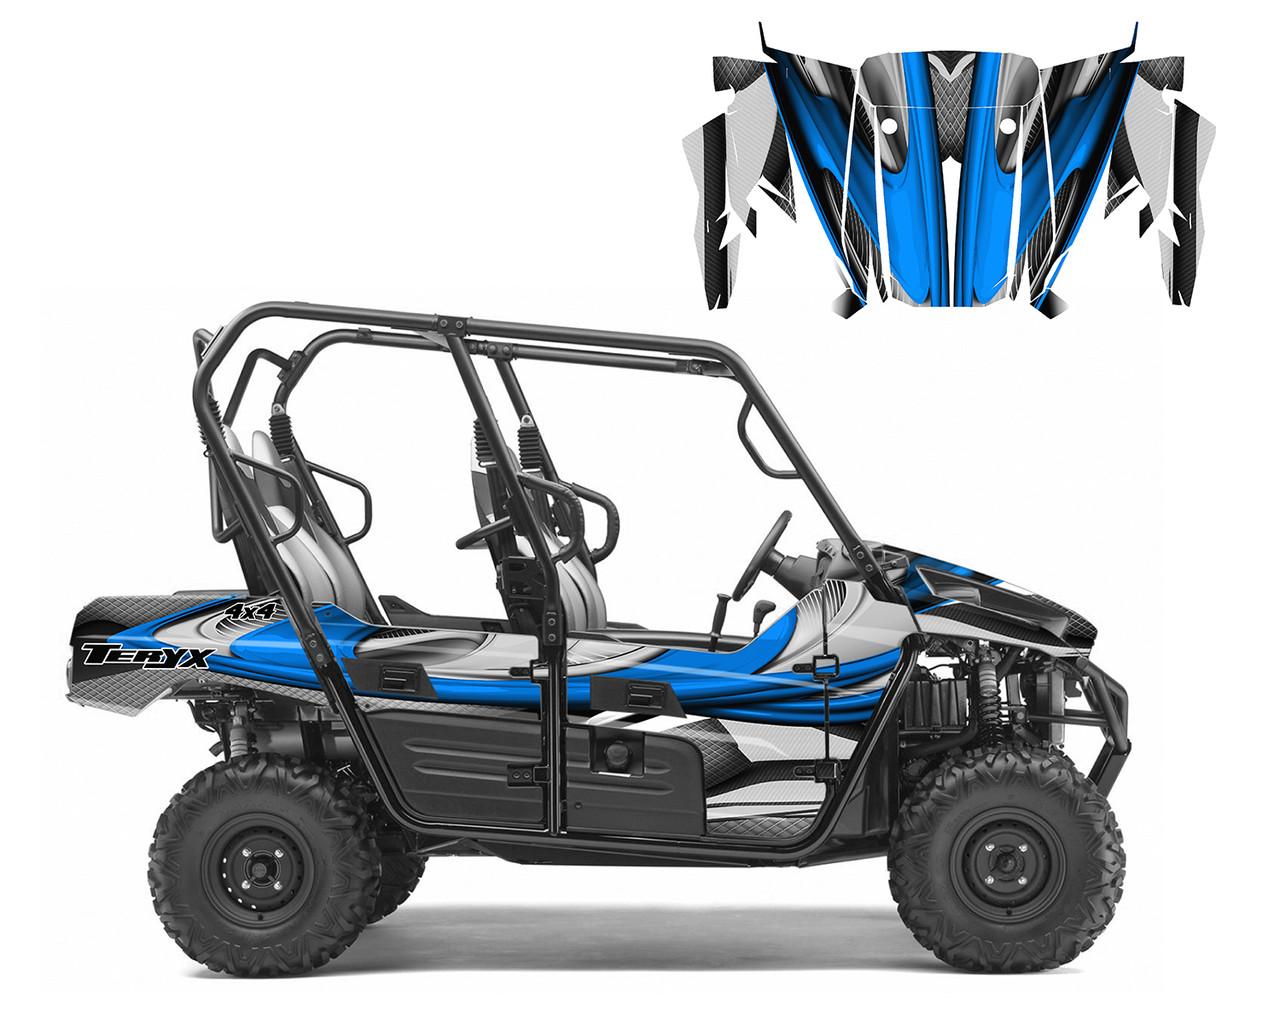 Premium wrap graphics for Kawasaki Teryx